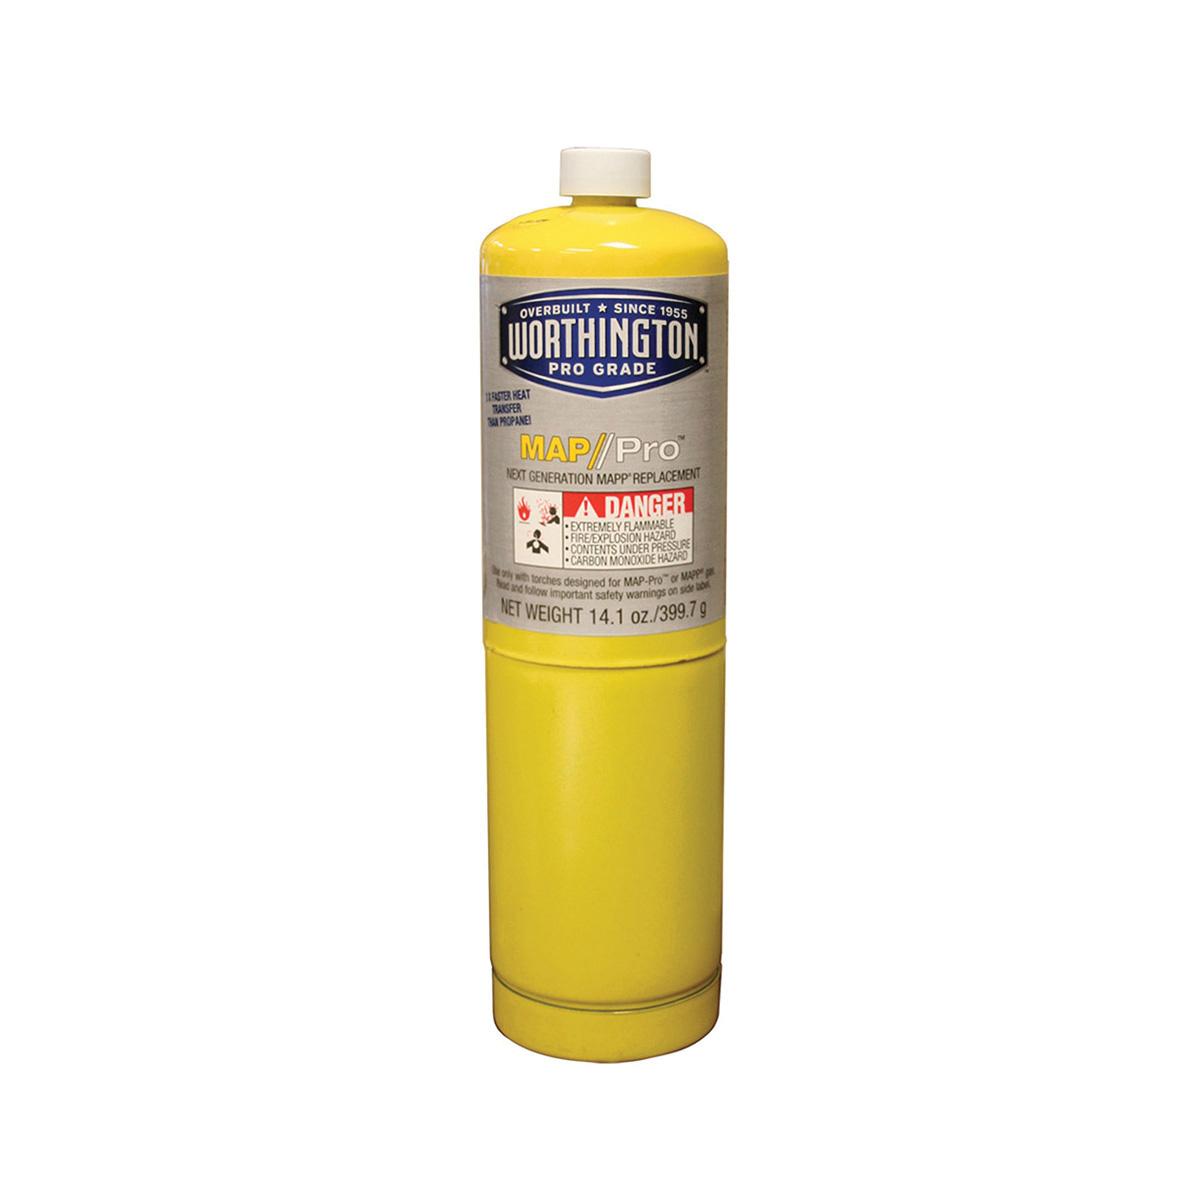 Jones Stephens™ PlumBest™ J40600 Flammable Gas Cylinder, 14.1 oz MAPP Gas